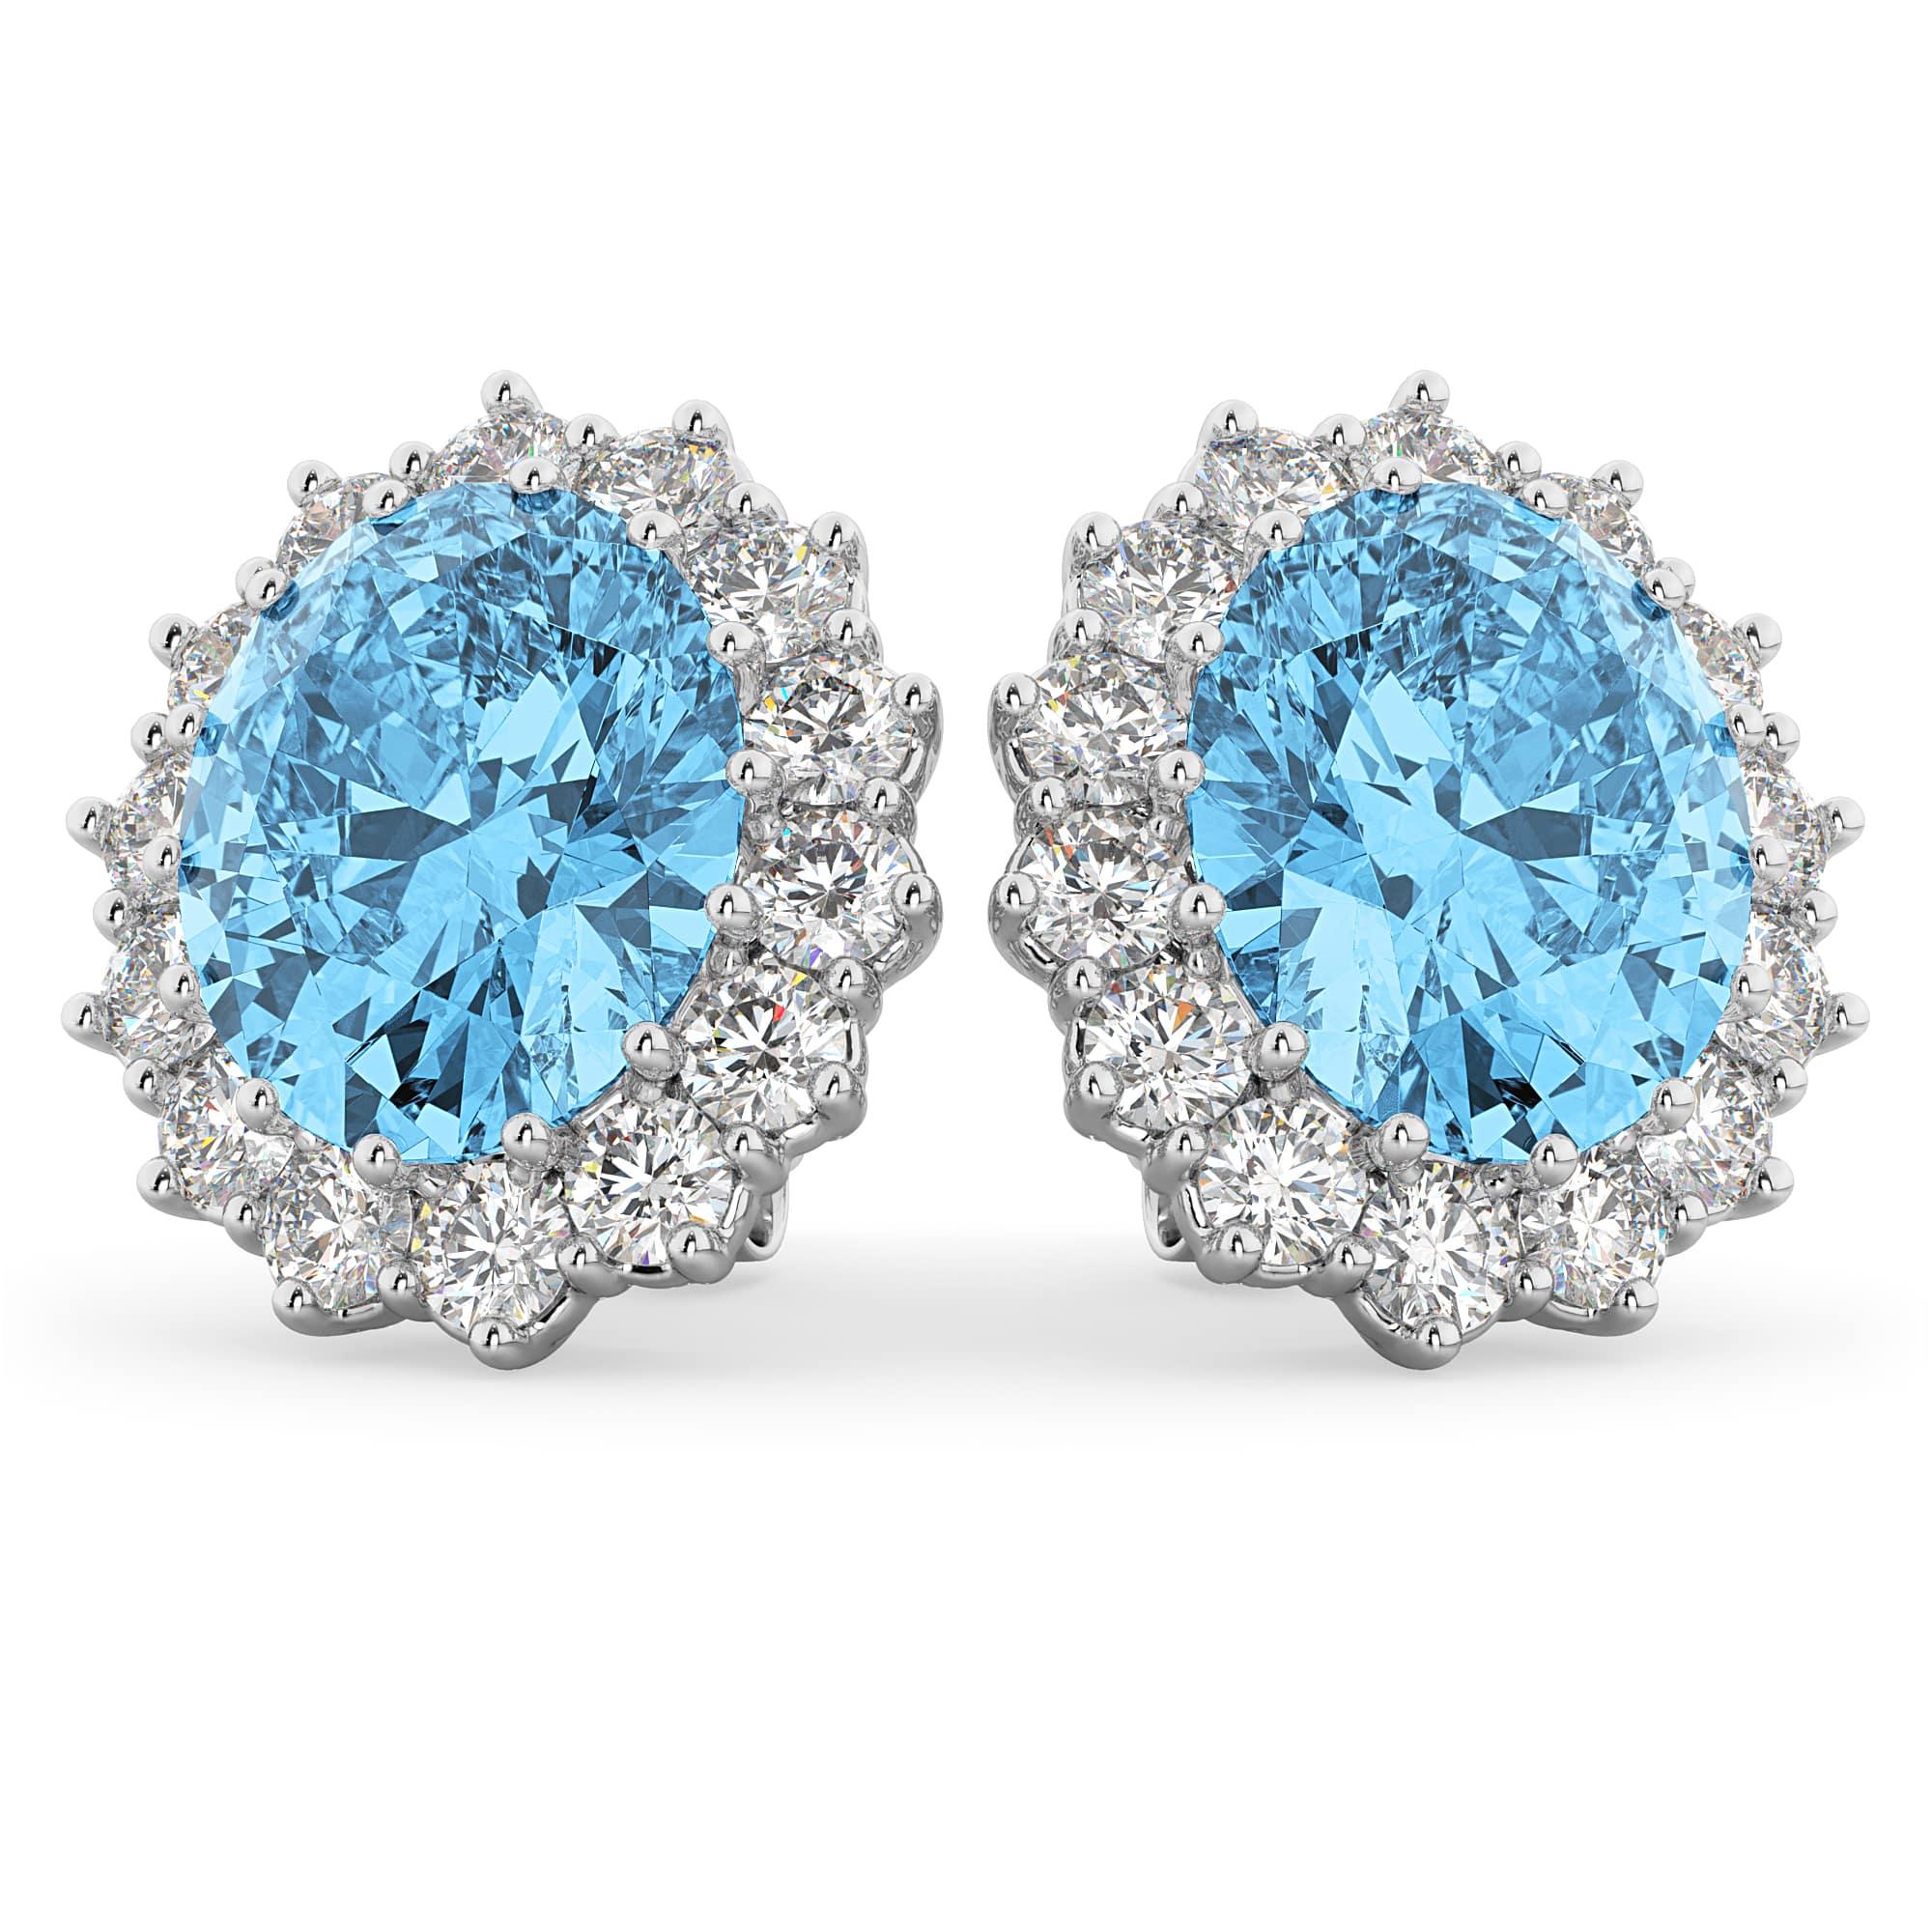 Oval Blue Topaz & Diamond Accented Earrings 14k White Gold (10.80ctw)